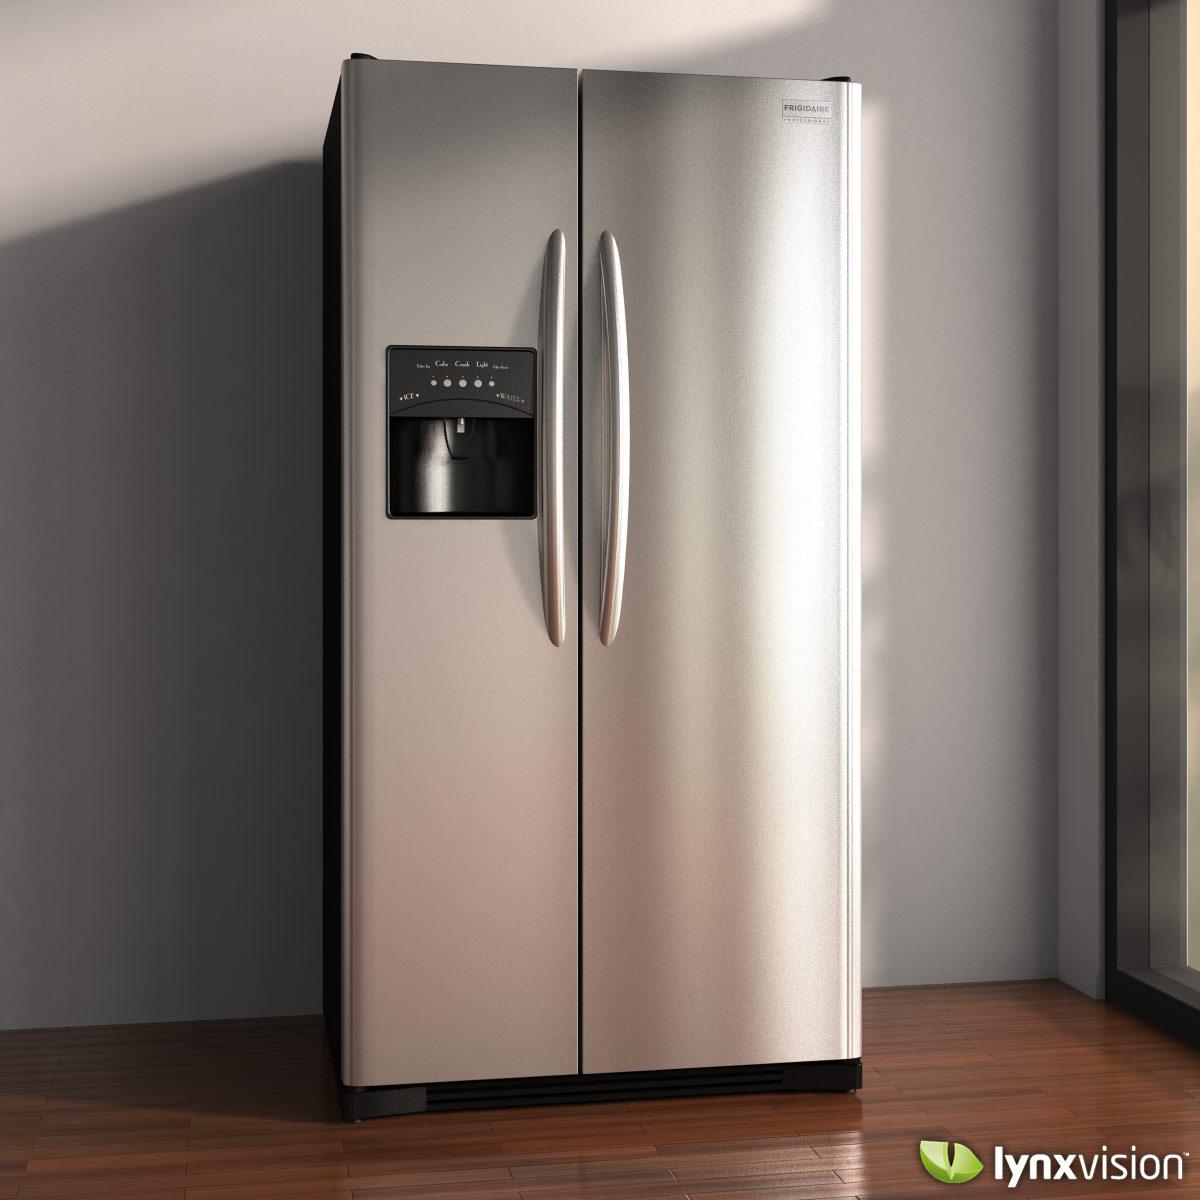 frigidaire professional refrigerator 3d model max obj. Black Bedroom Furniture Sets. Home Design Ideas